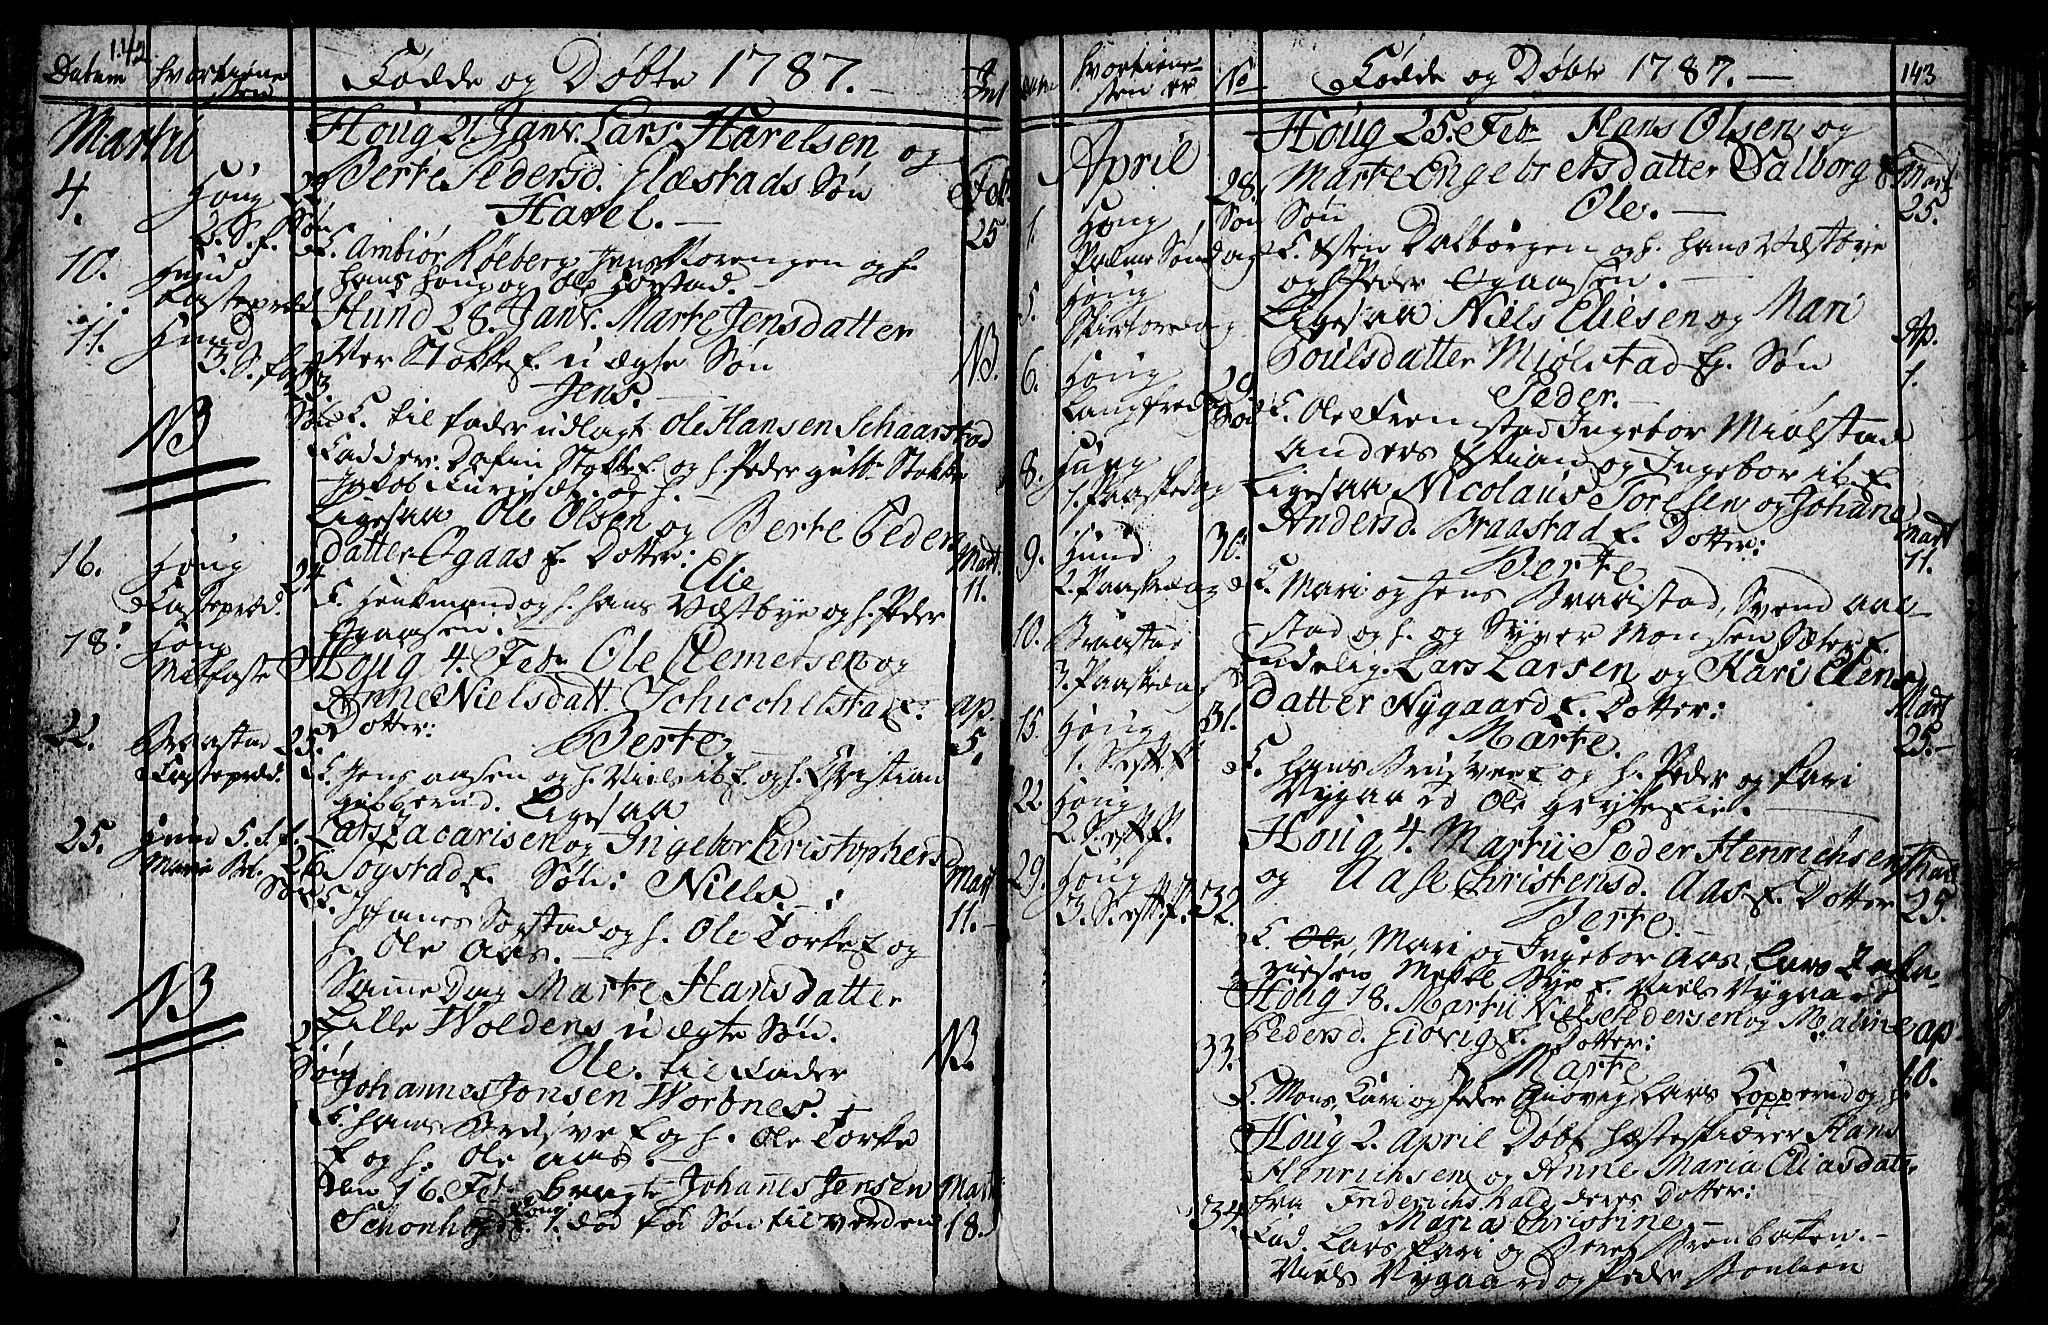 SAH, Vardal prestekontor, H/Ha/Hab/L0001: Klokkerbok nr. 1, 1771-1790, s. 142-143